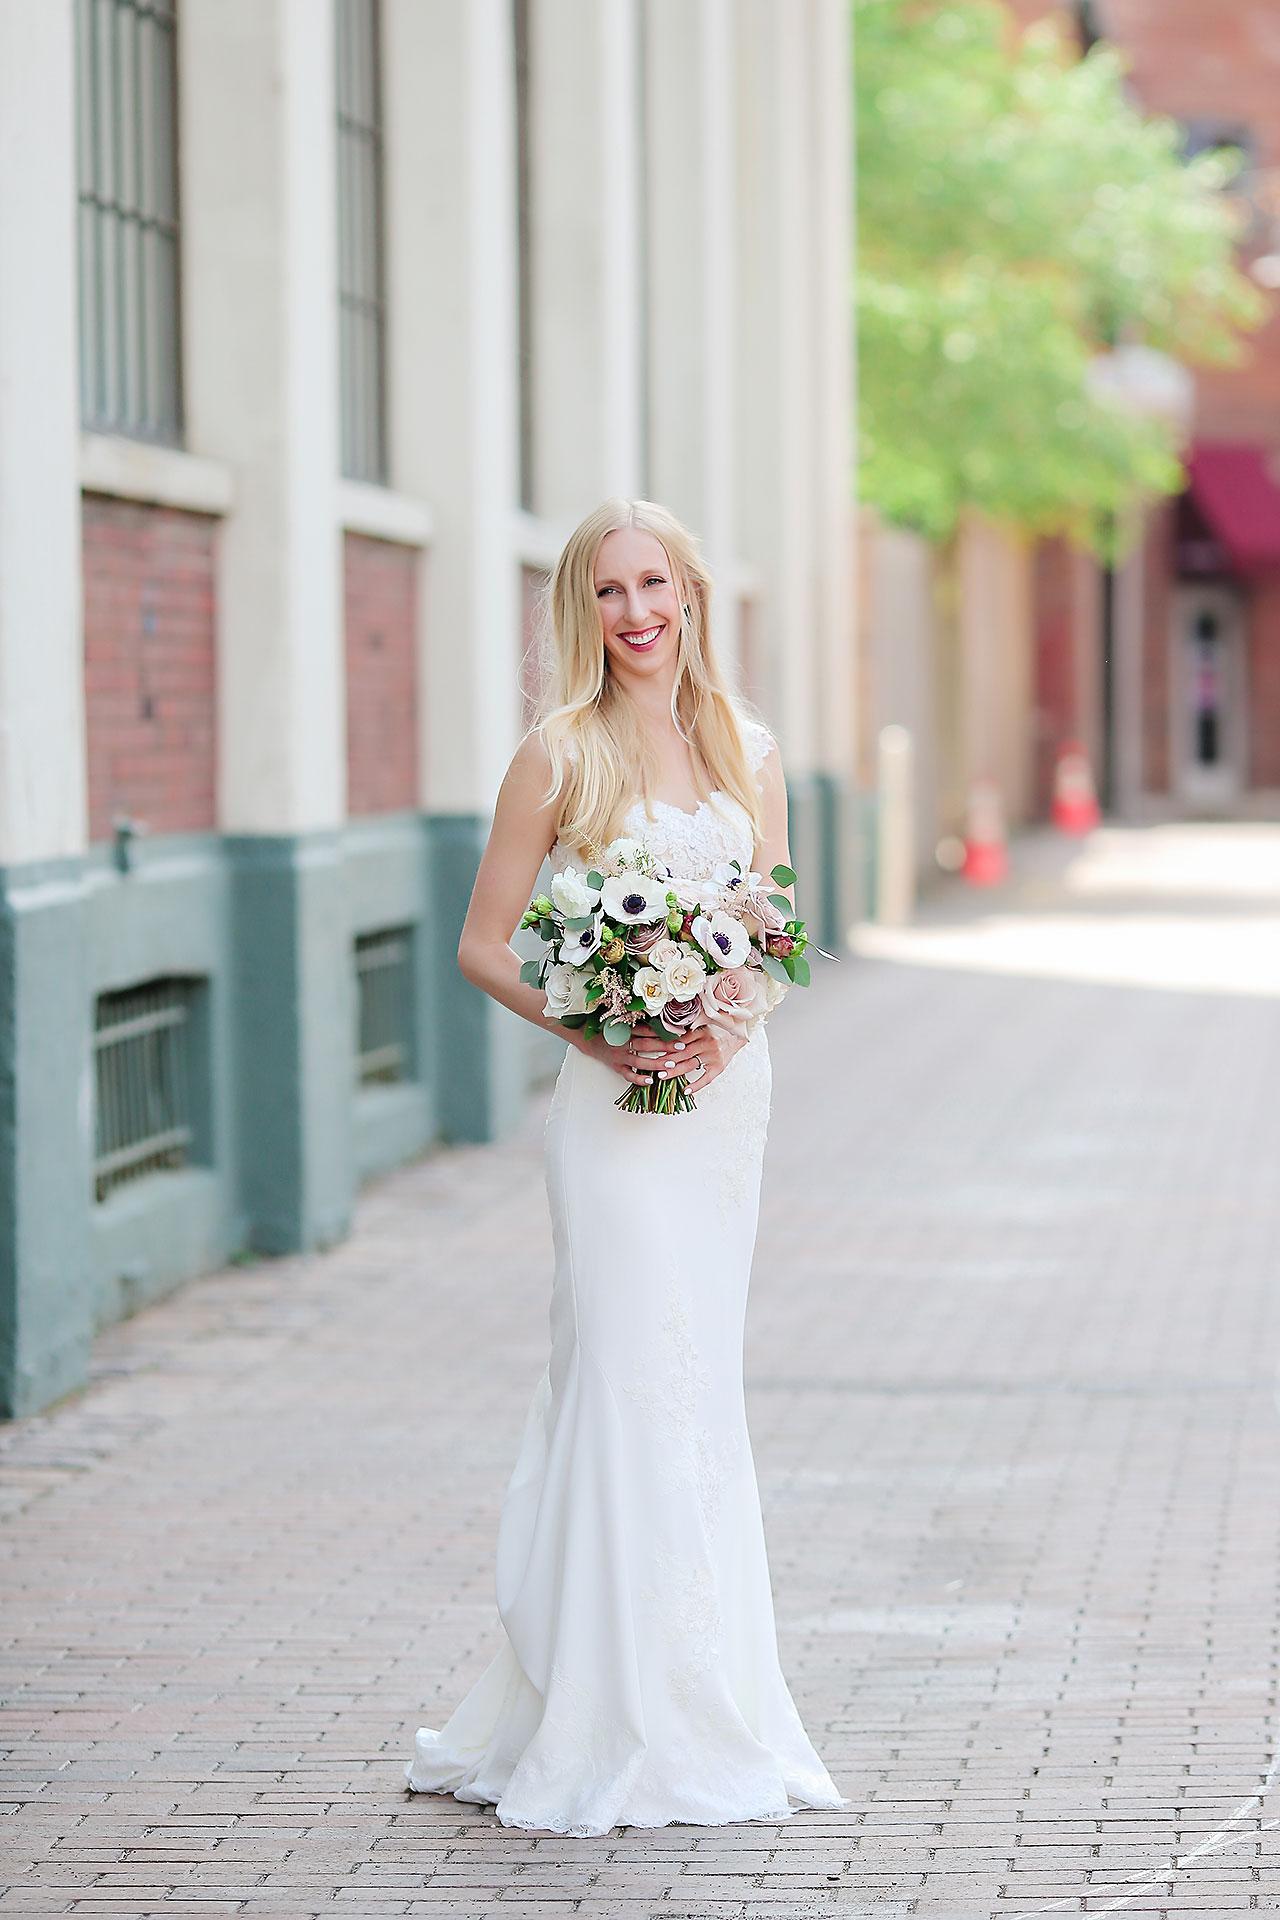 Molly Declan Scottish Rite Indianapolis Wedding 073